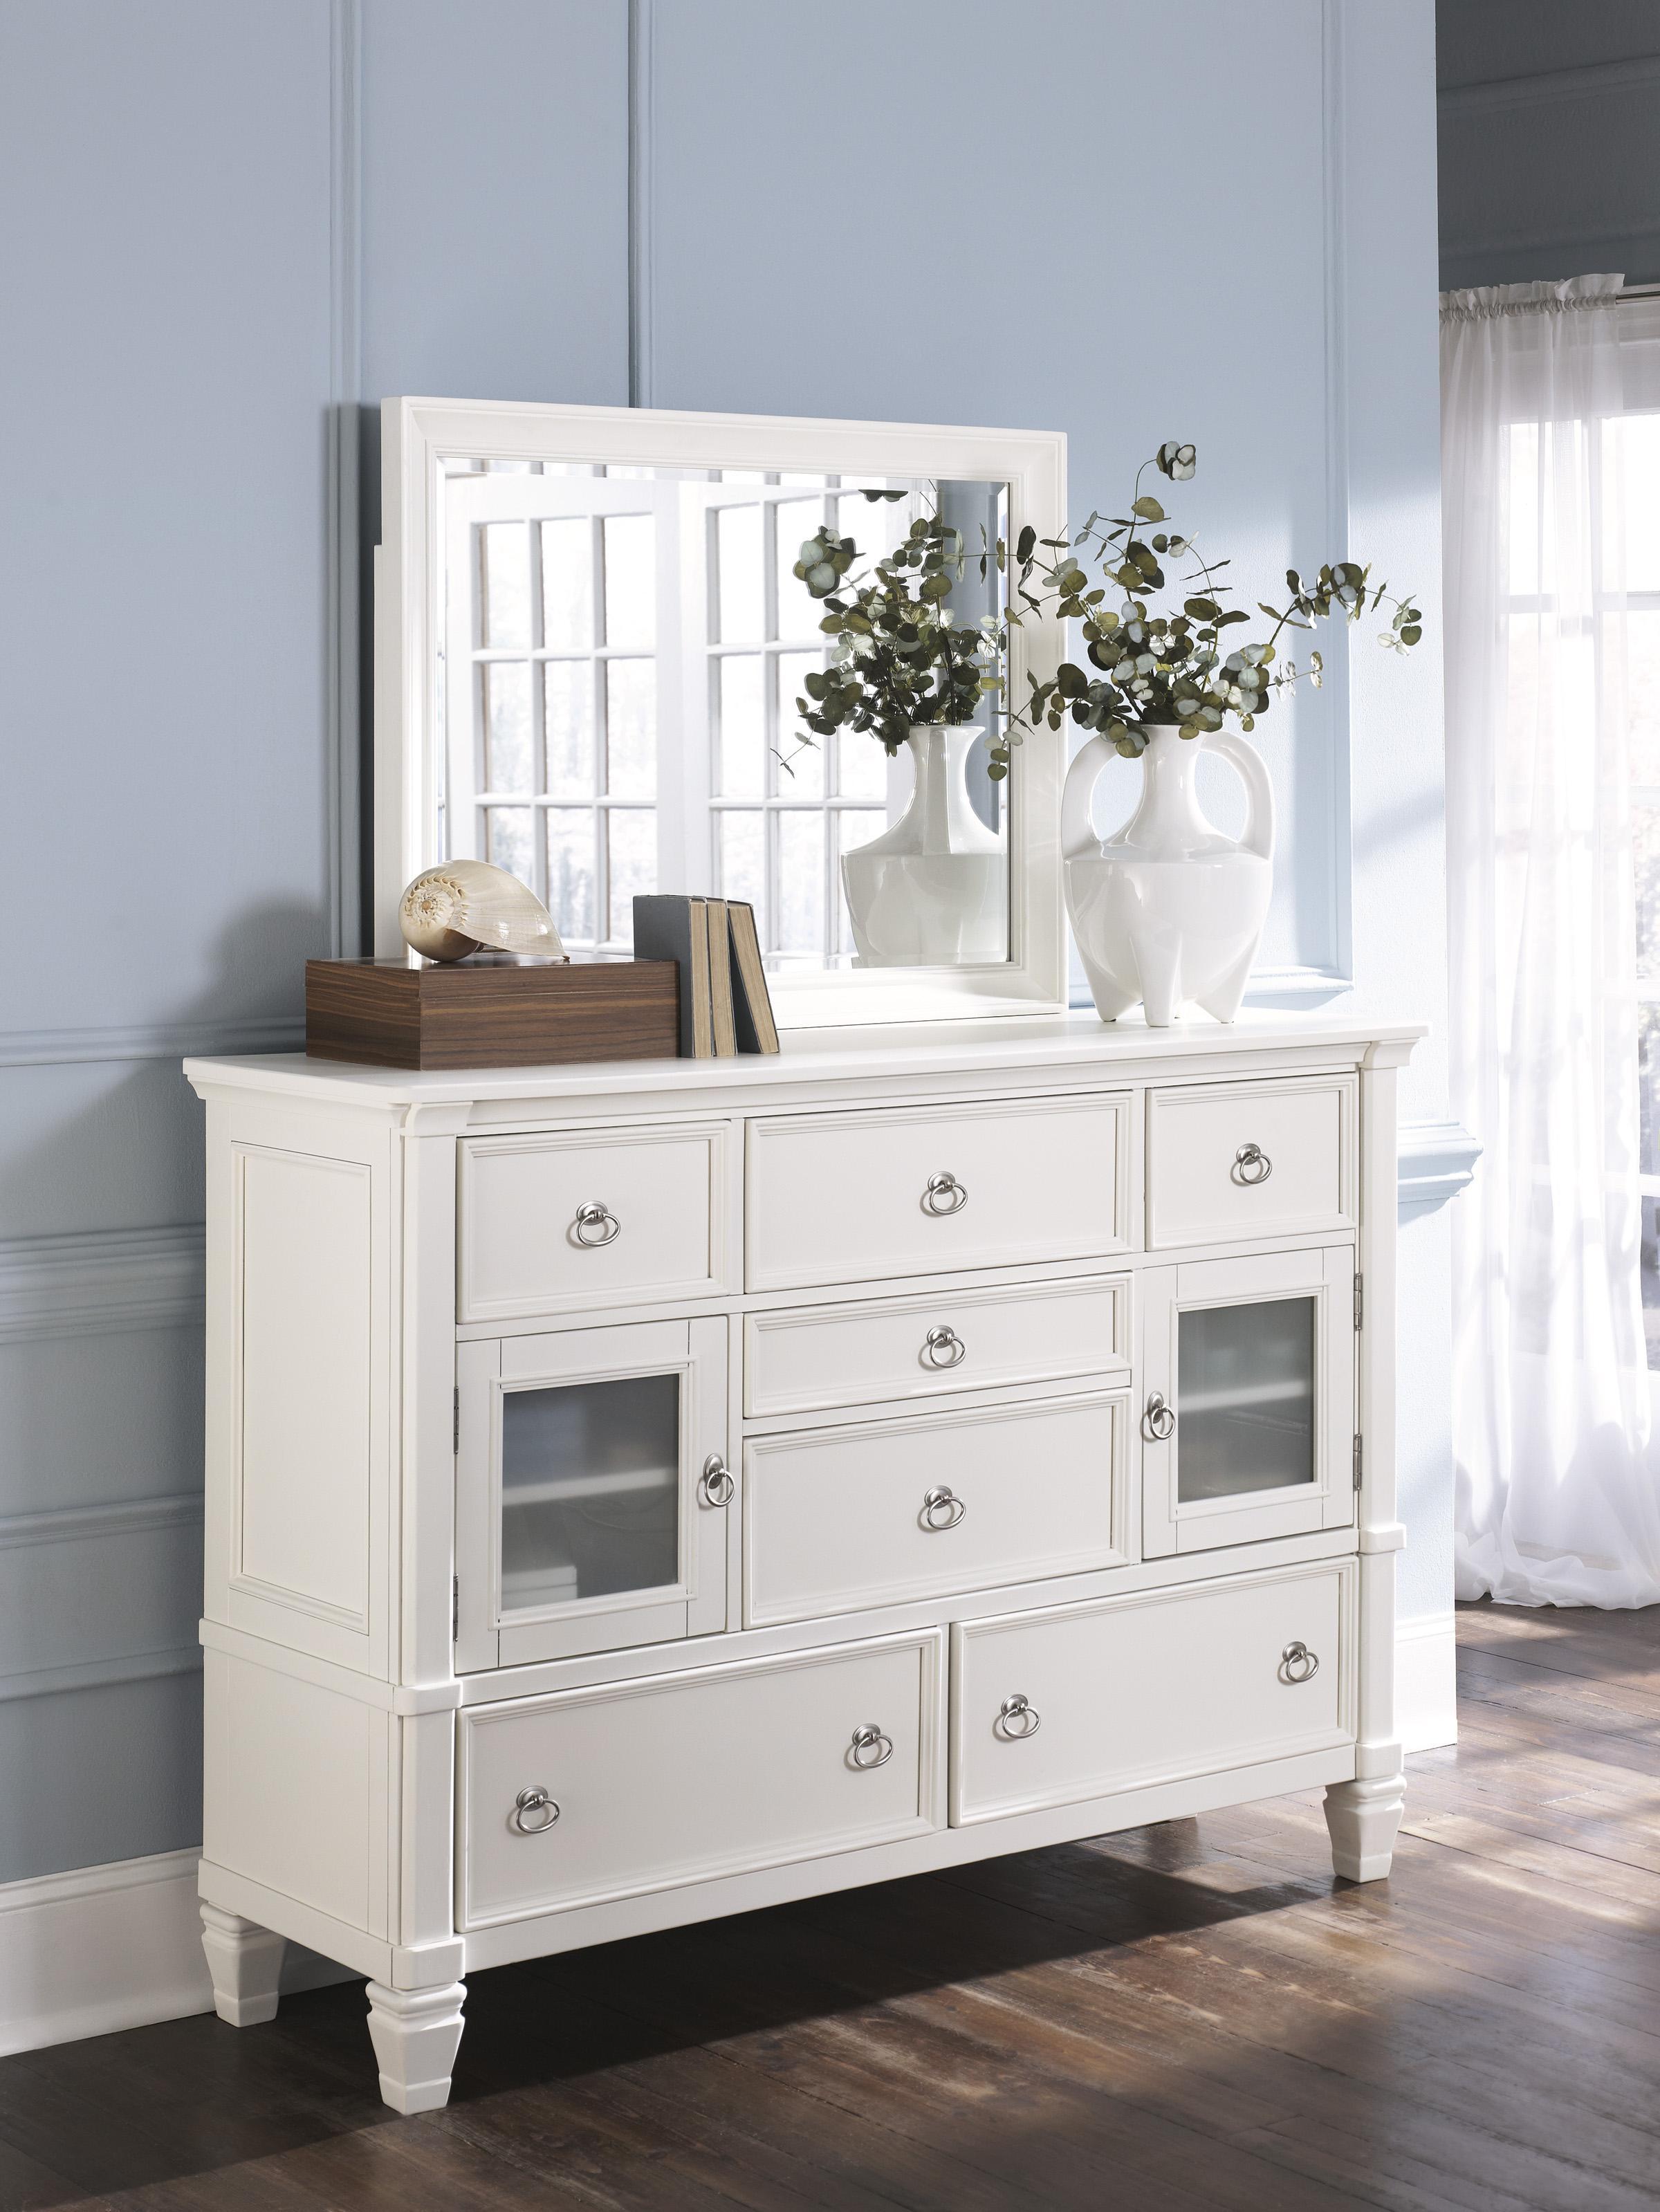 millennium prentice 7 drawer dresser with glass door